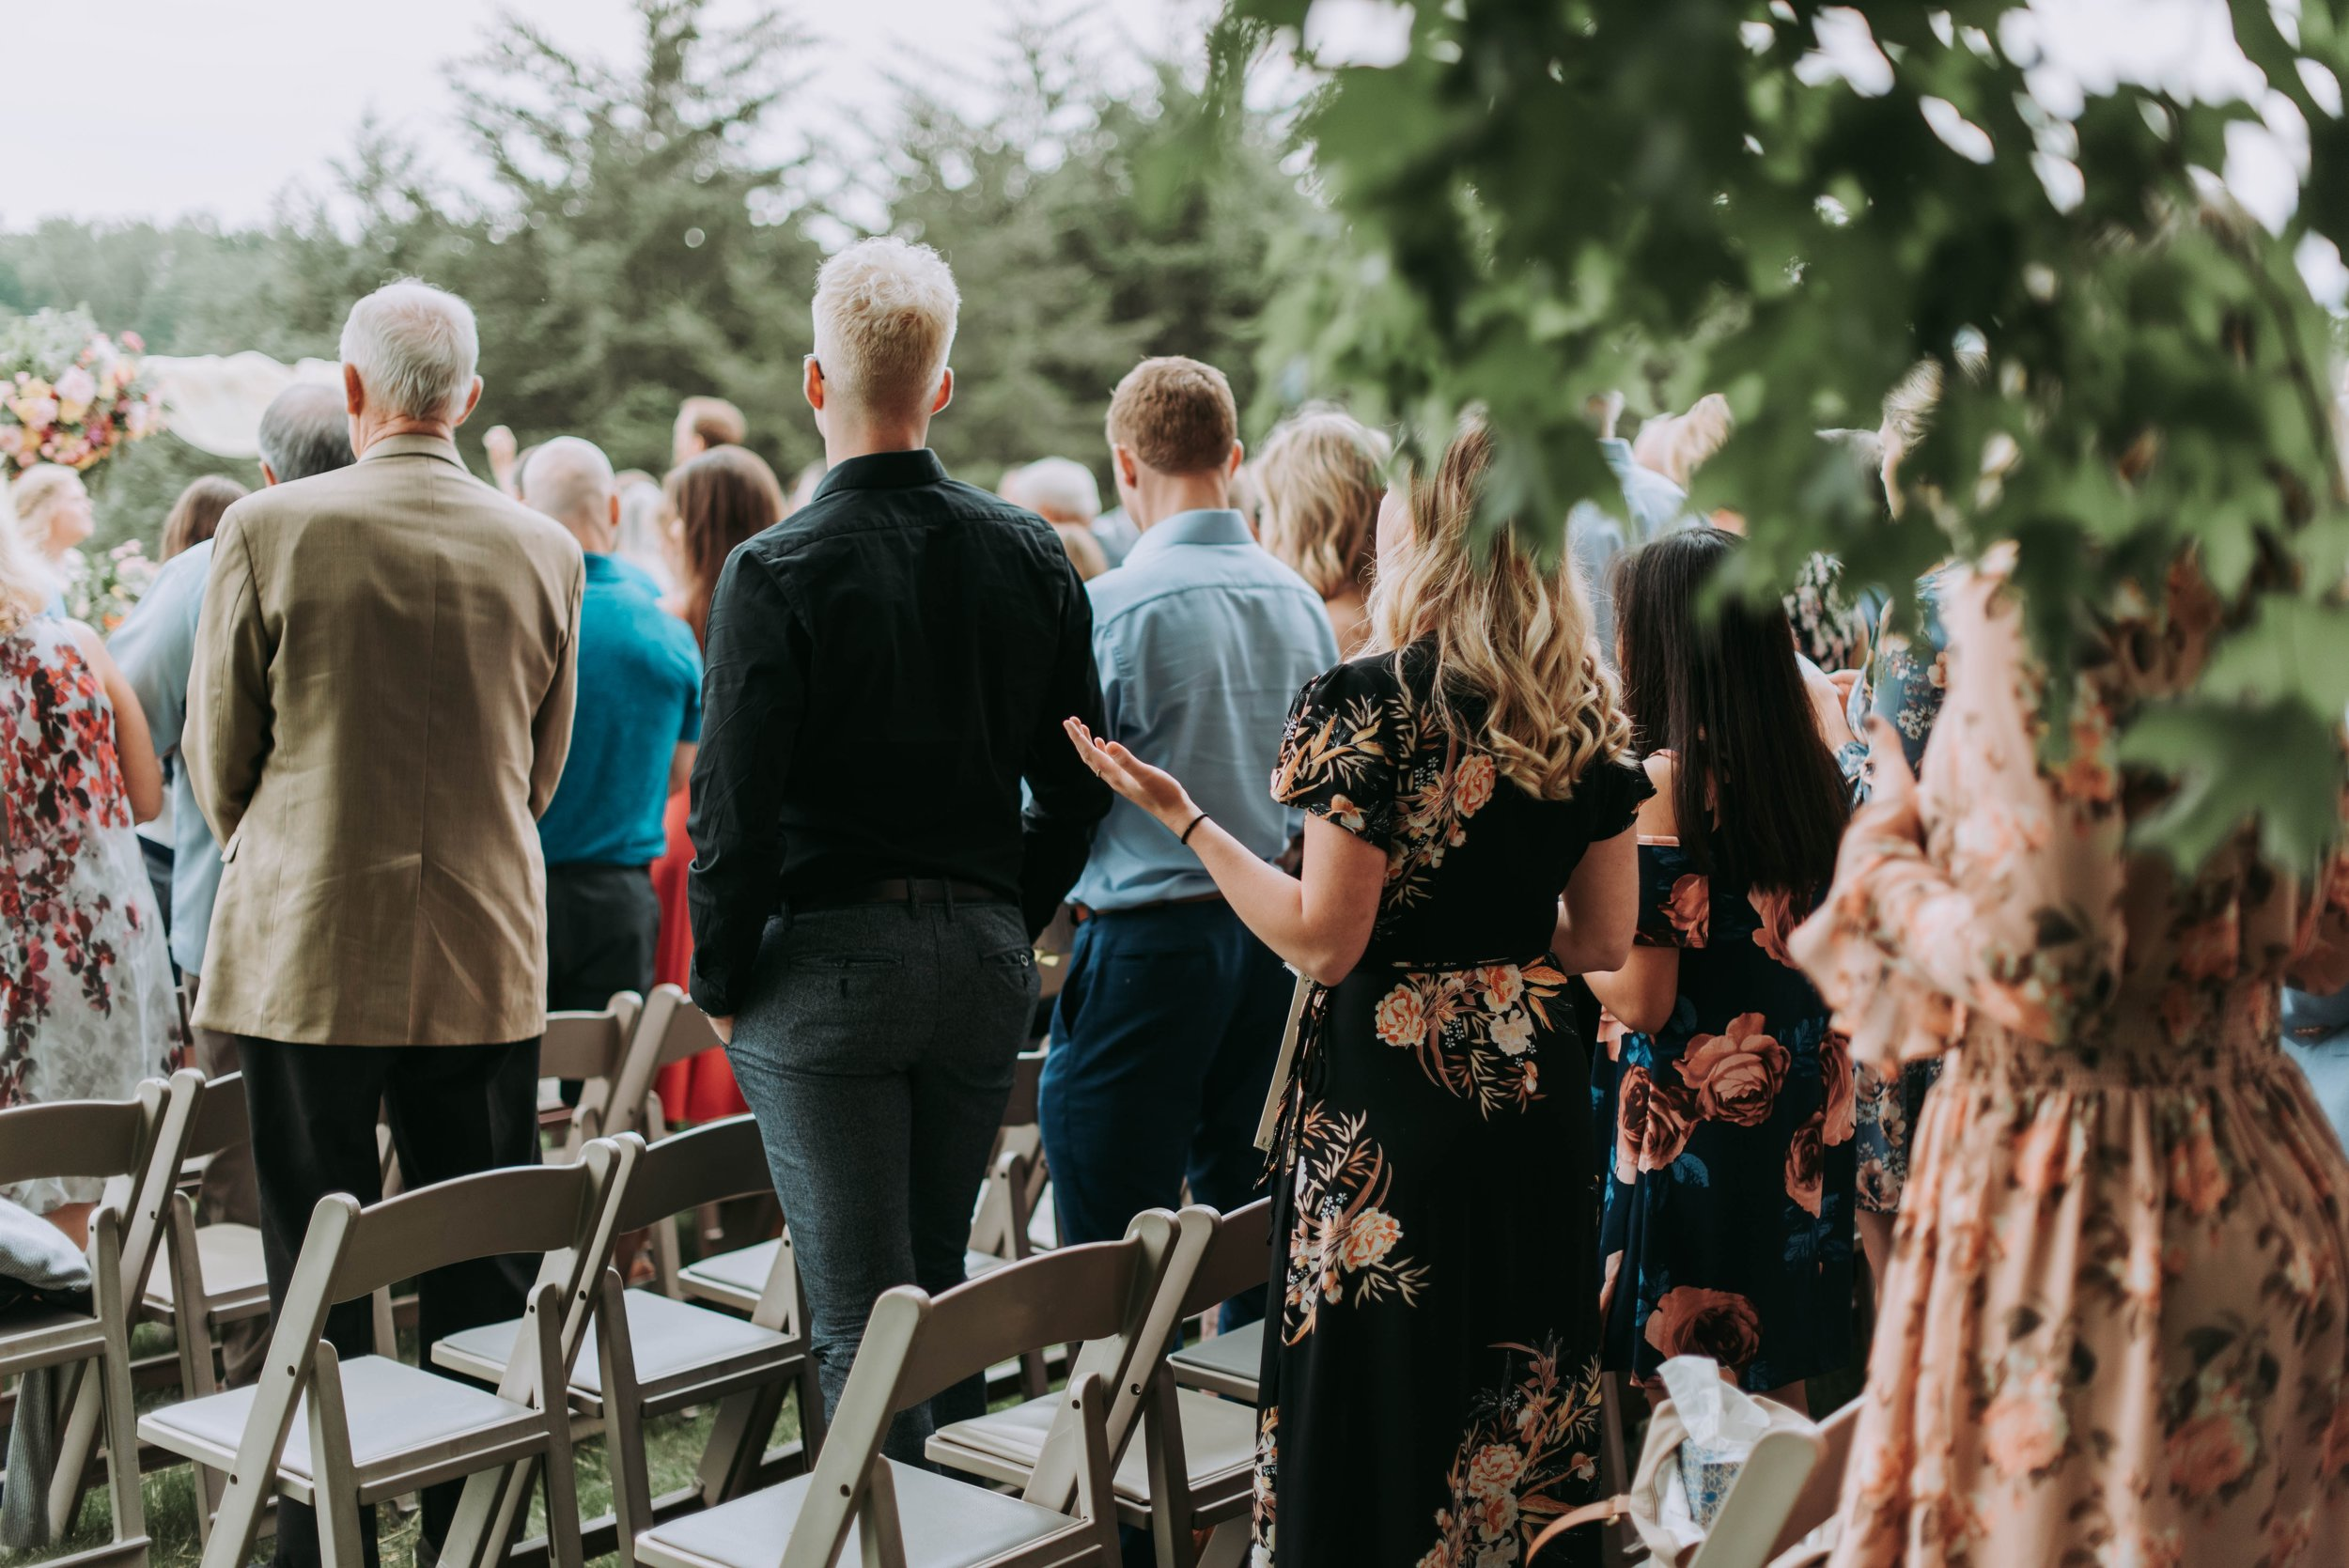 wedding-guests-ceremony-etiquette.jpg